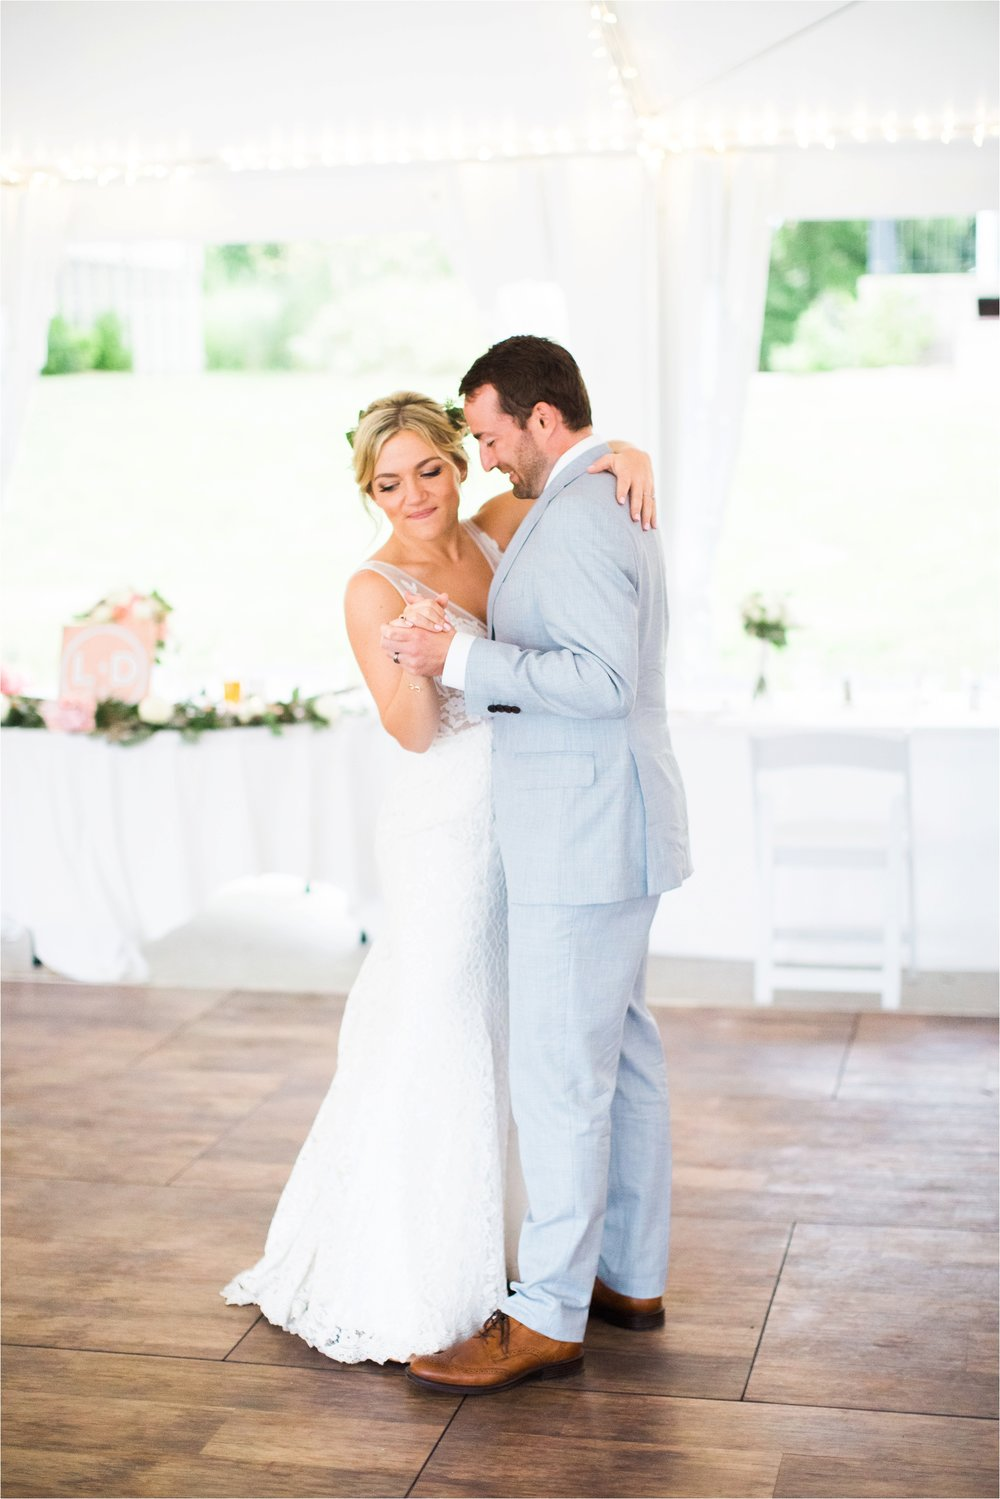 West-Michigan-wedding-photographer-Tifani-Lyn-The-Felt-Mansion-Estate-Wedding-Venue-Rose-Gold-Pink-Lis-Davis_0051.jpg